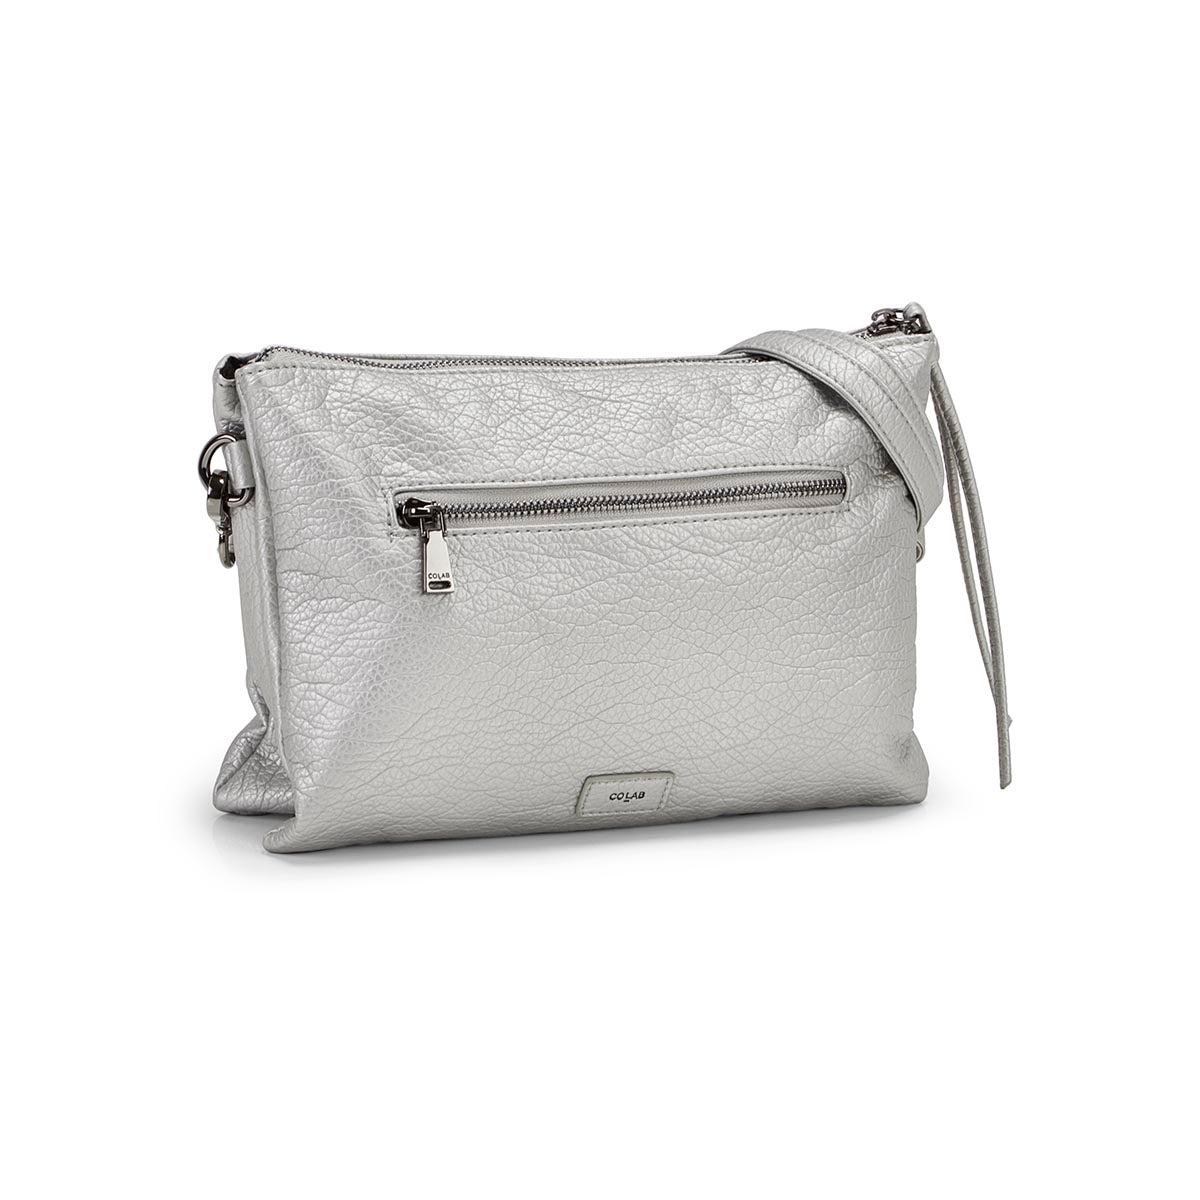 Lds silver clutch crossbody bag